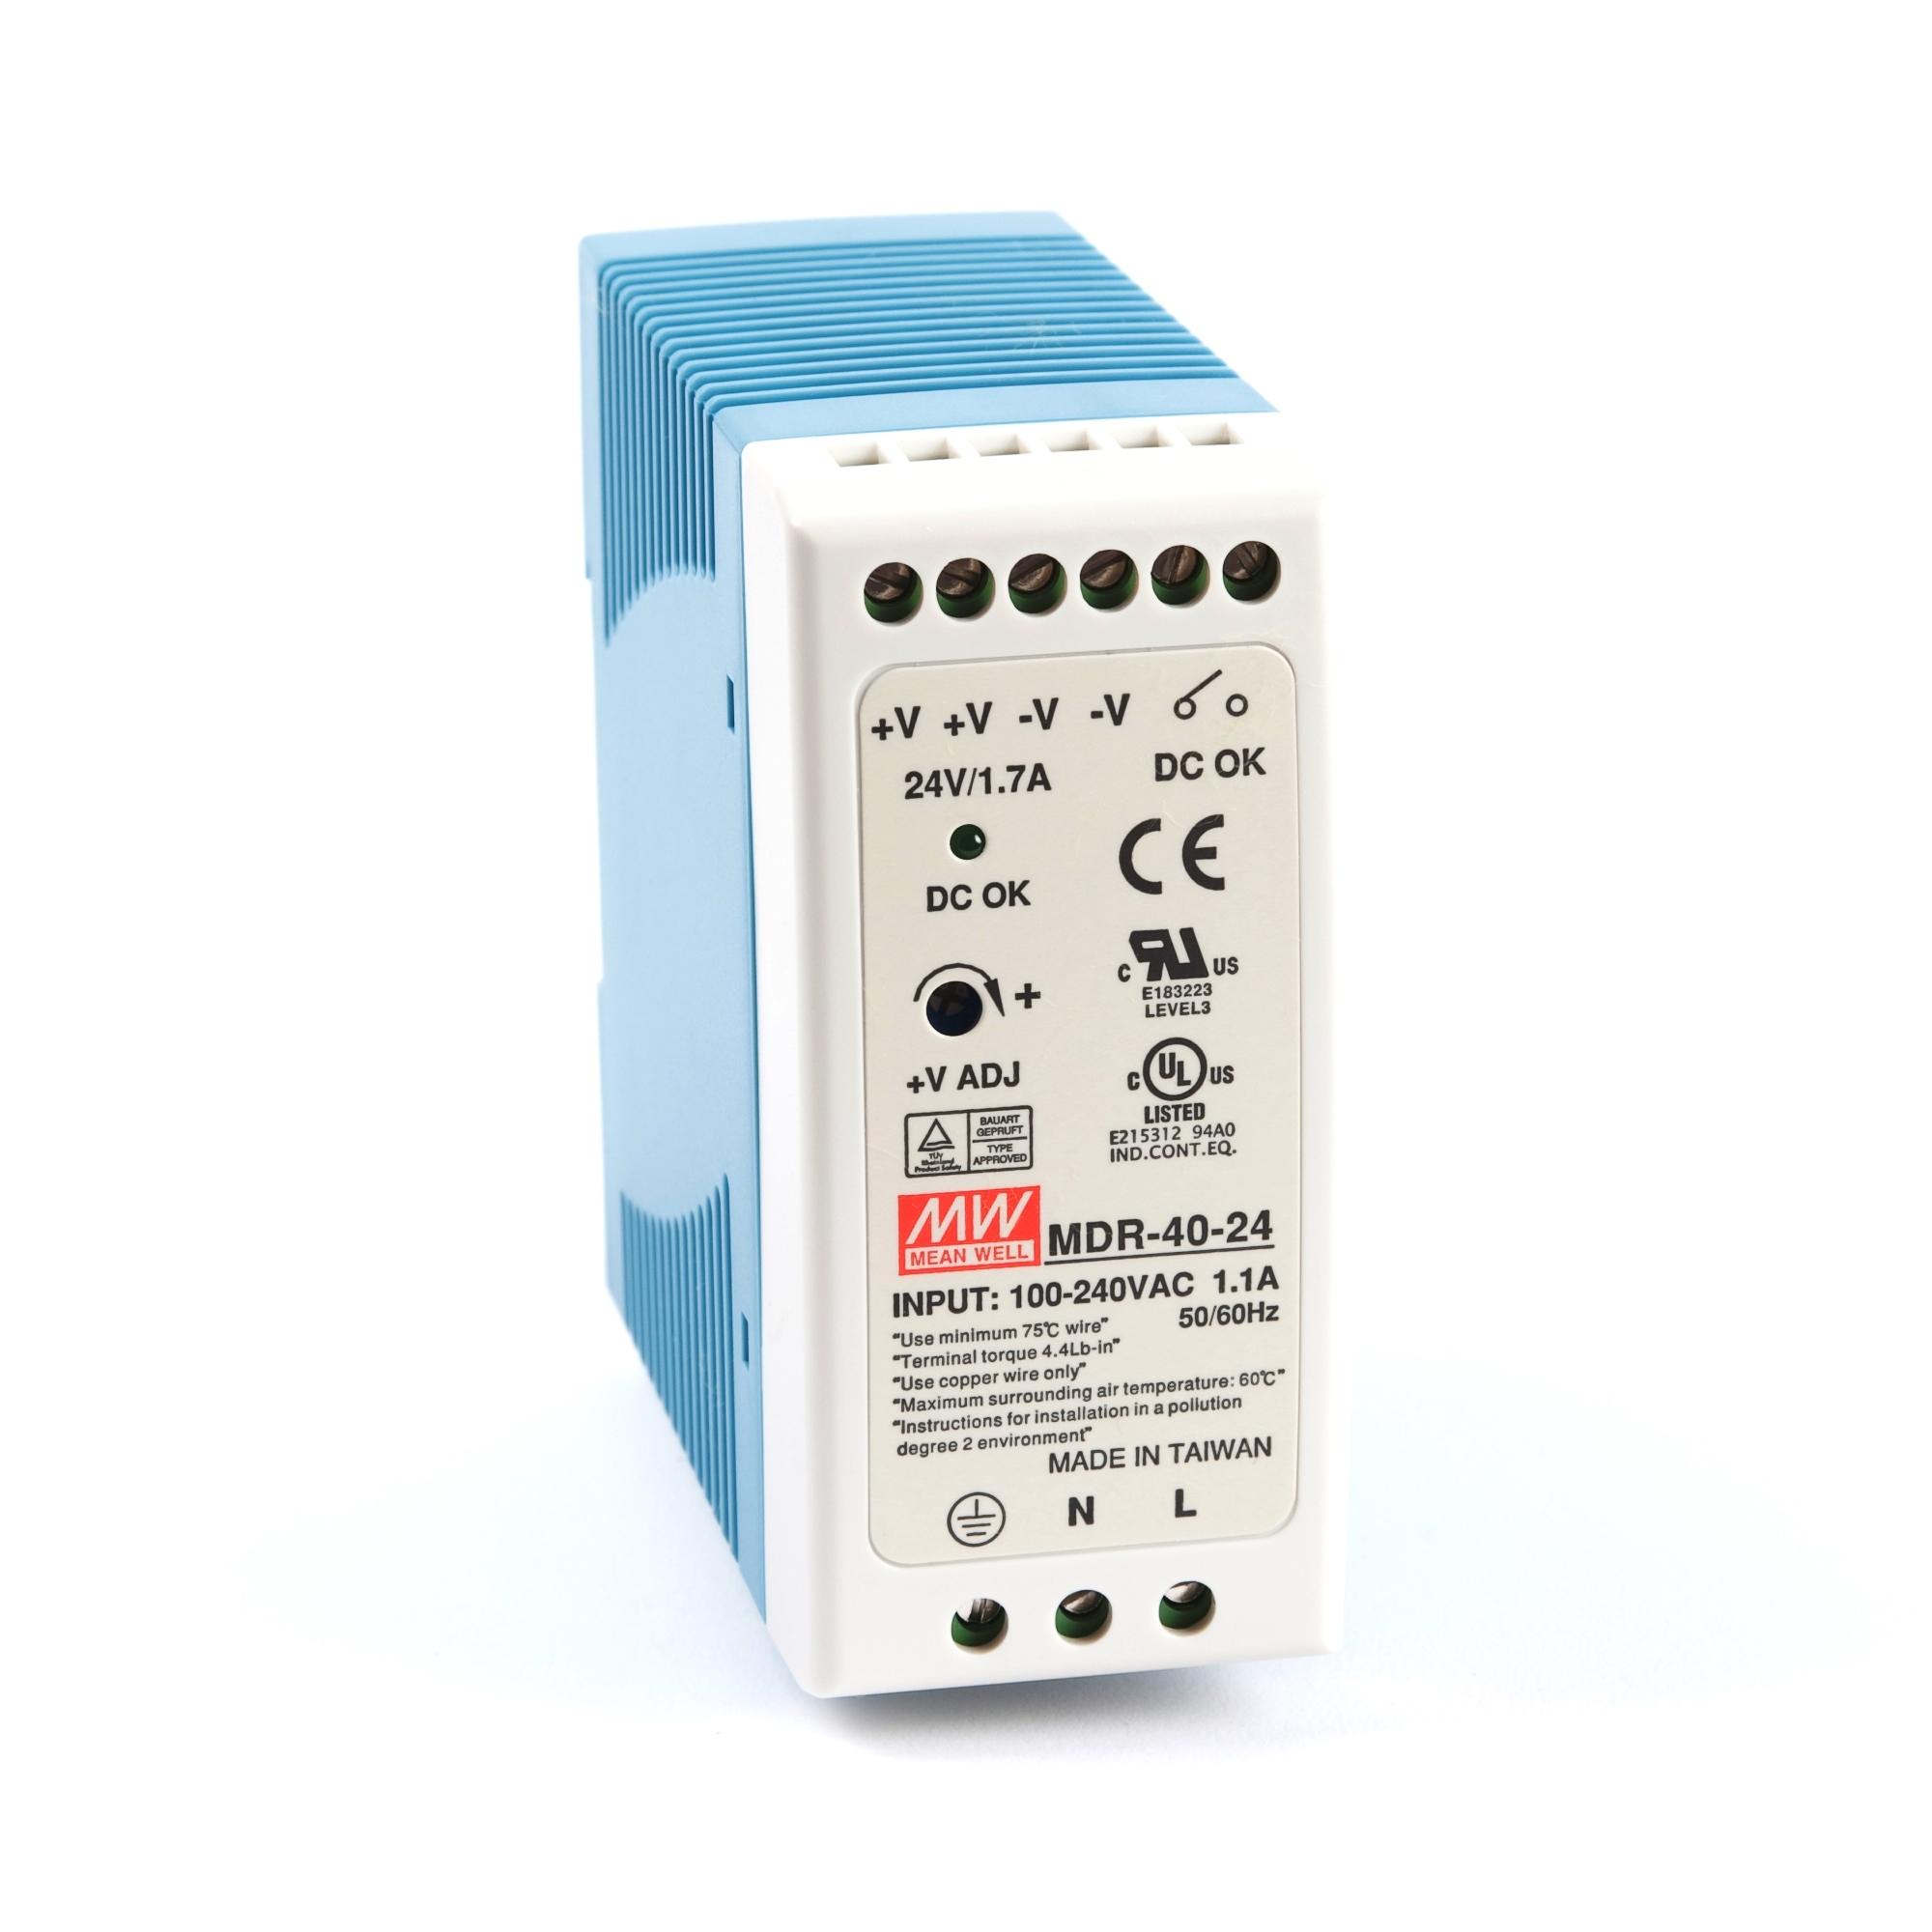 Mdr 40 Watt Miniature Din Rail Power Supply 24v Dc 1 7a